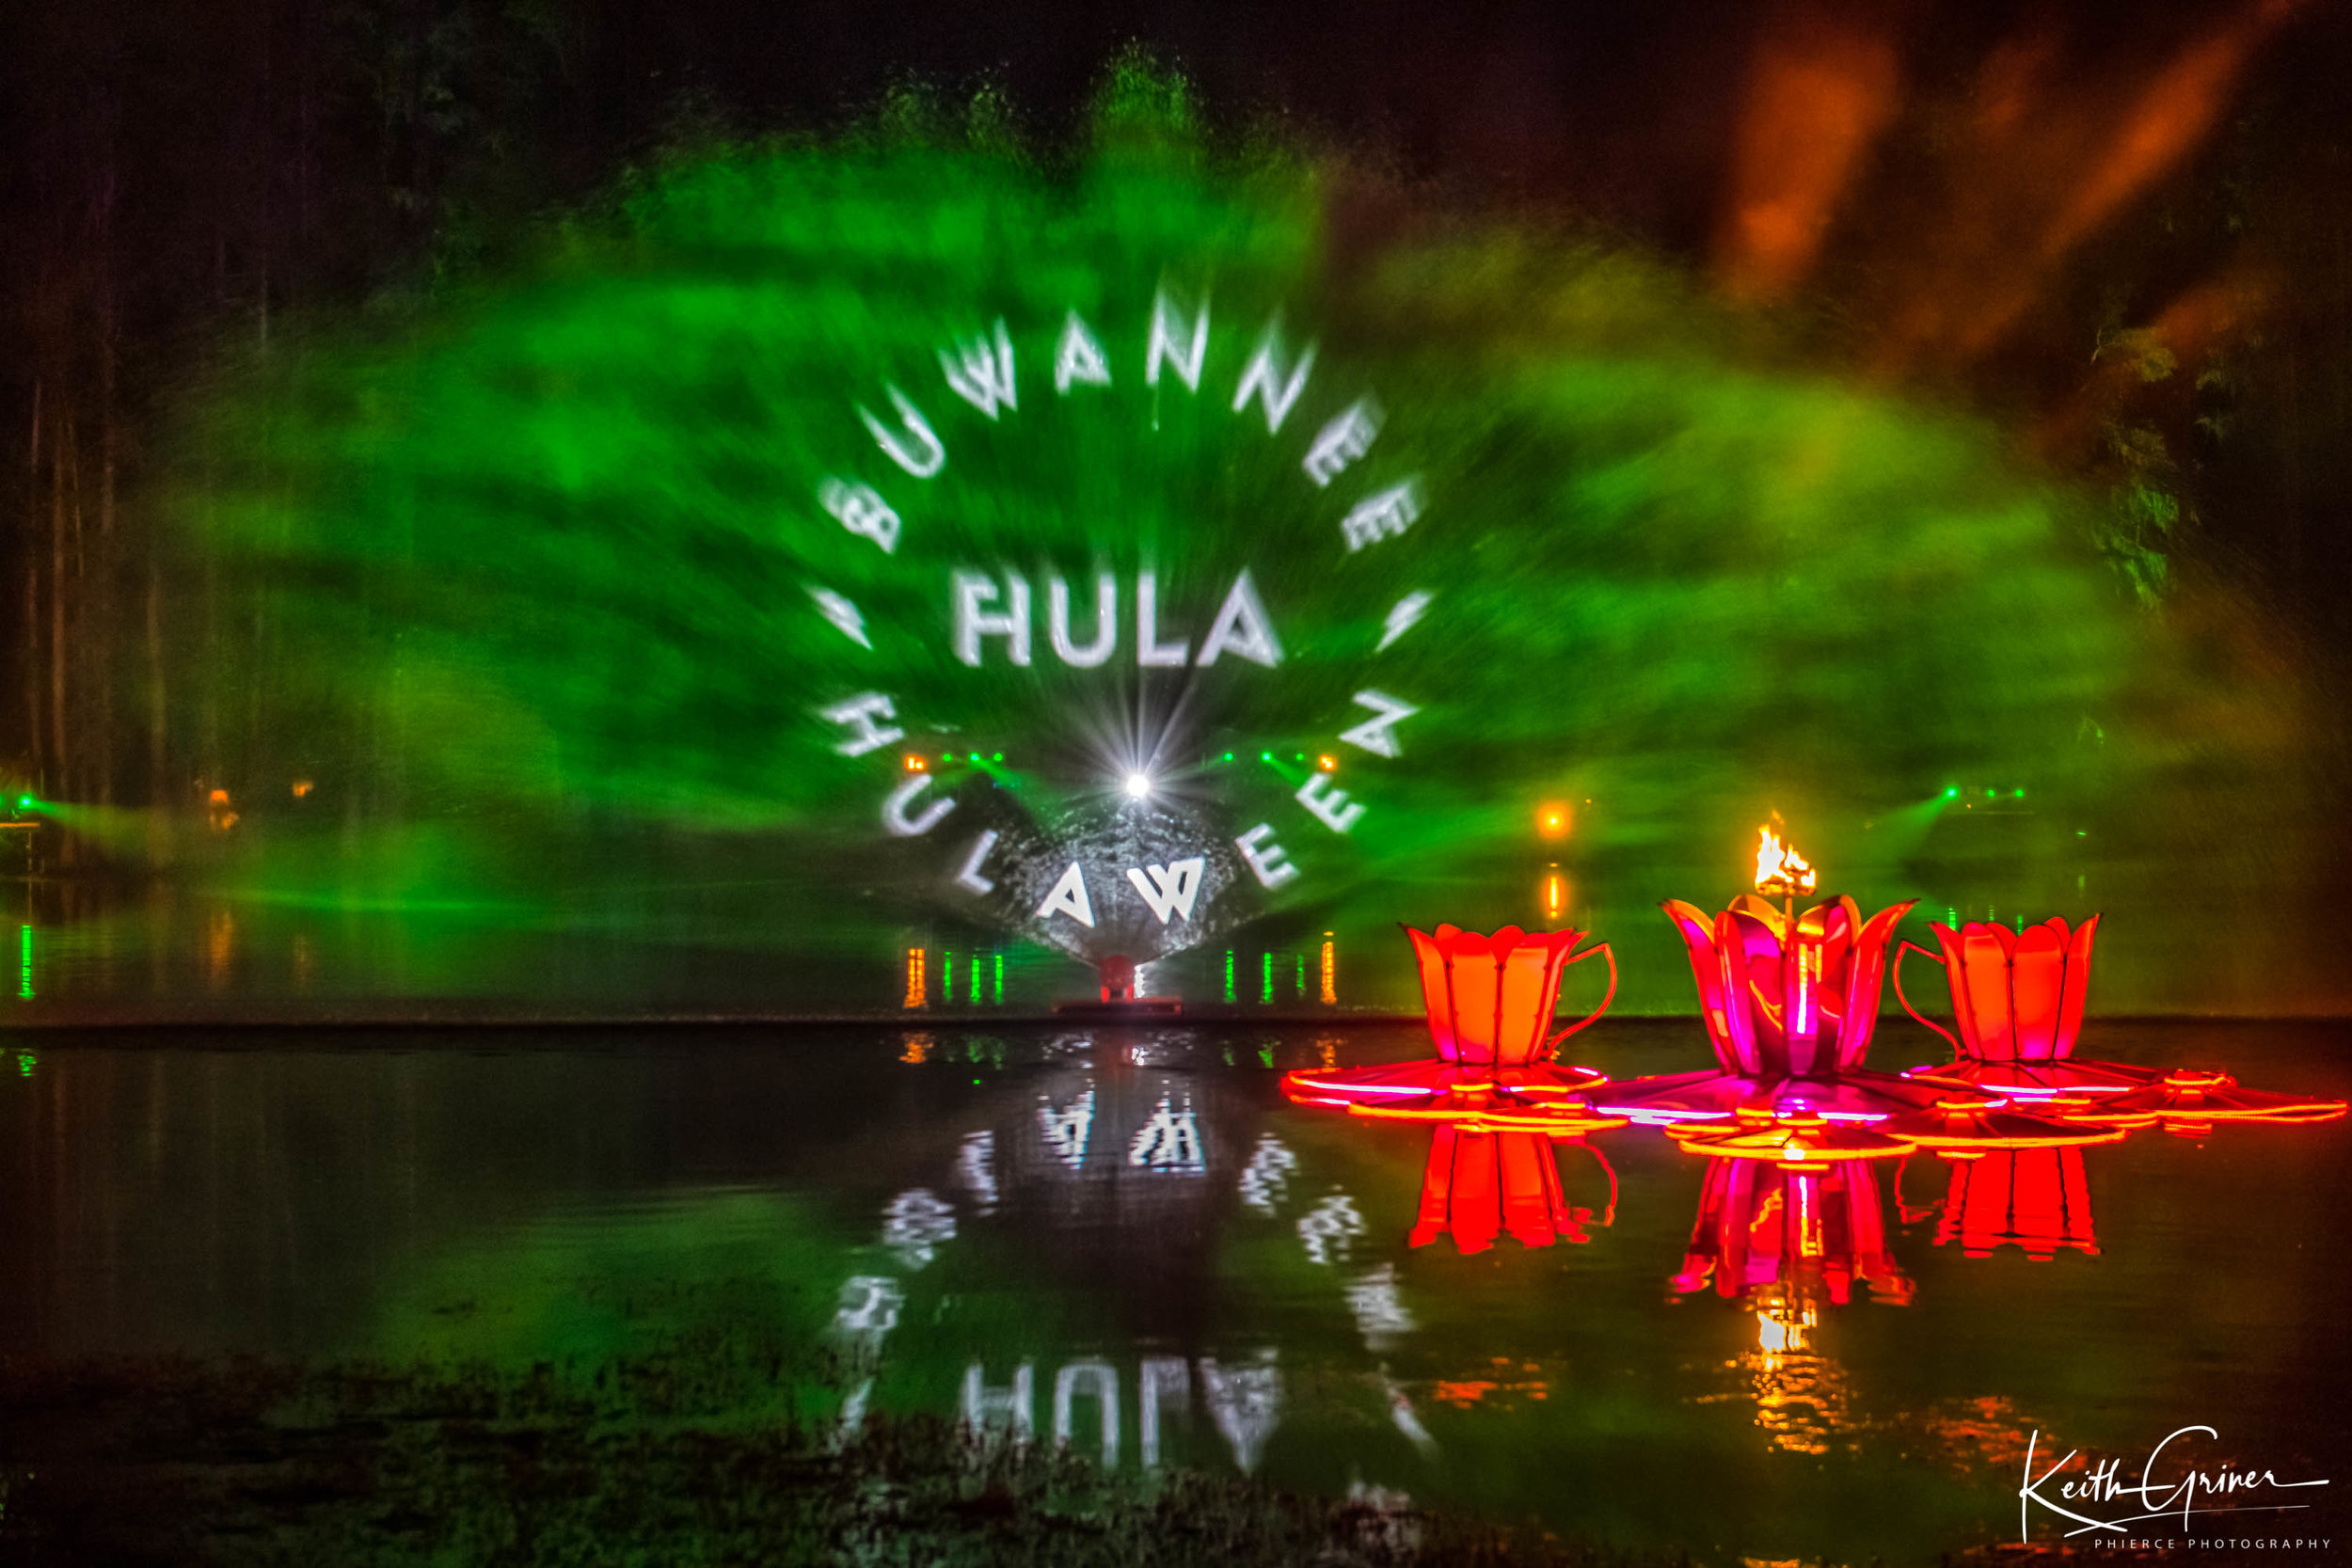 Hula_Spirit Lake_by Keith Griner 0D5_3295-Edit.jpg